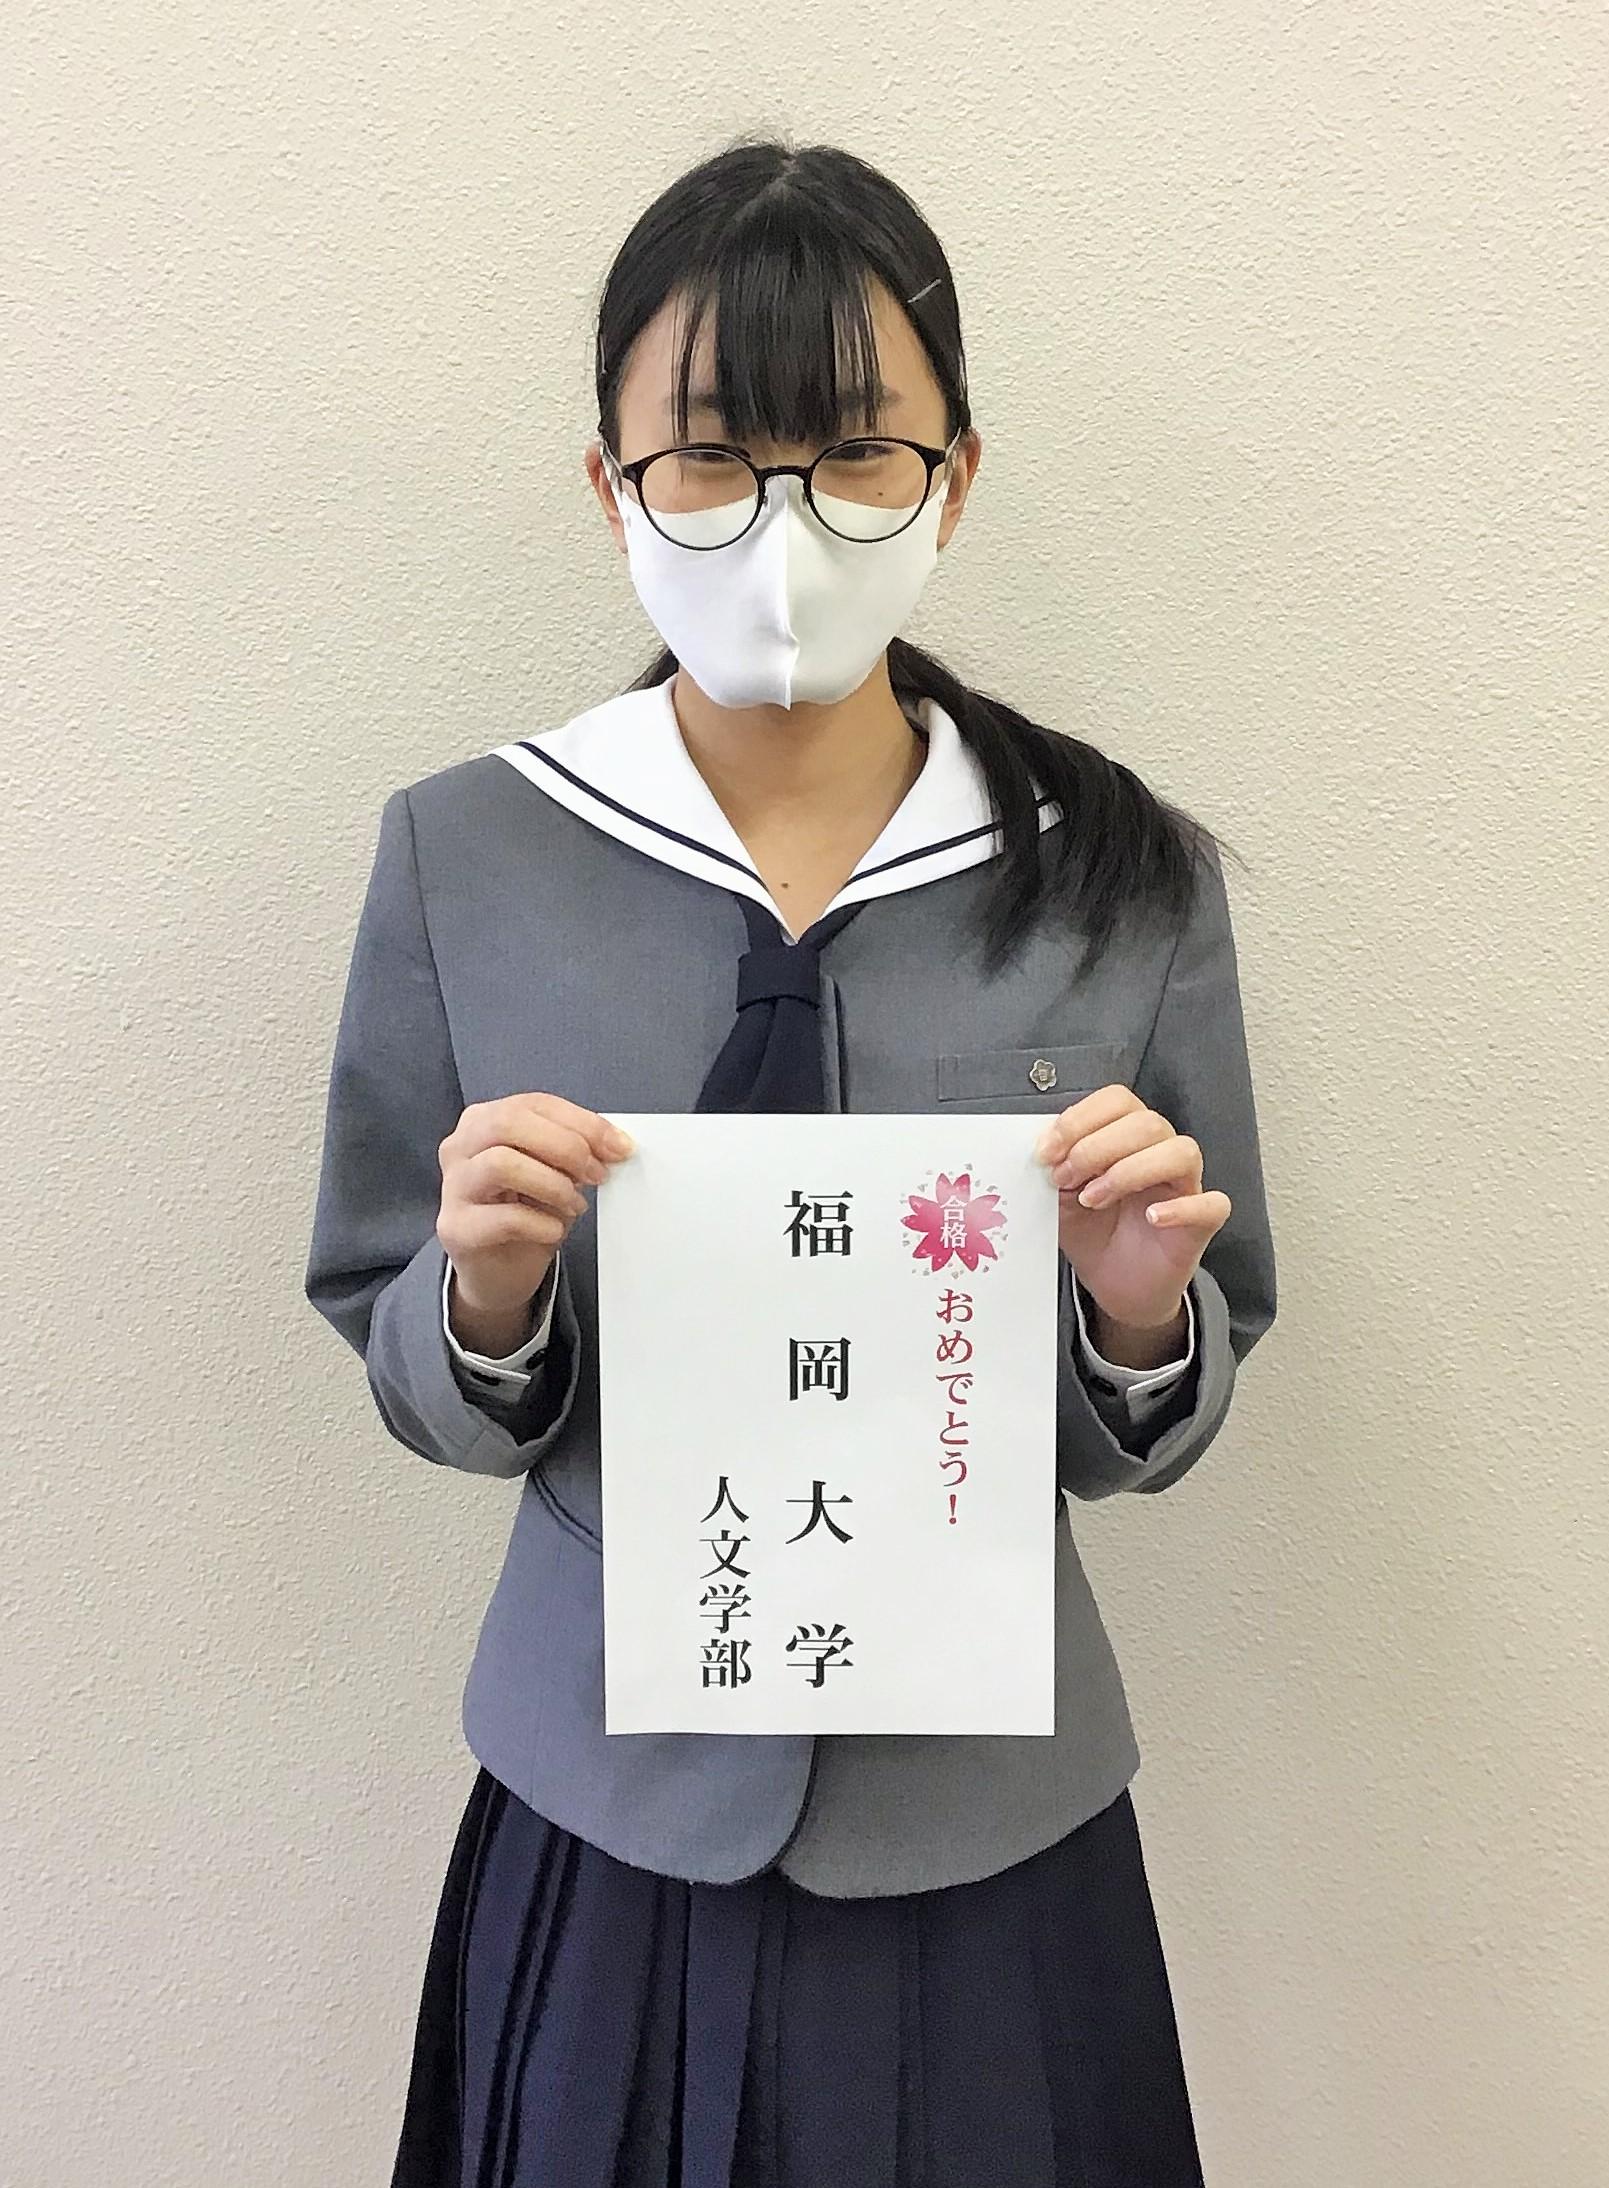 福岡 大学 指定 校 推薦 落ちる